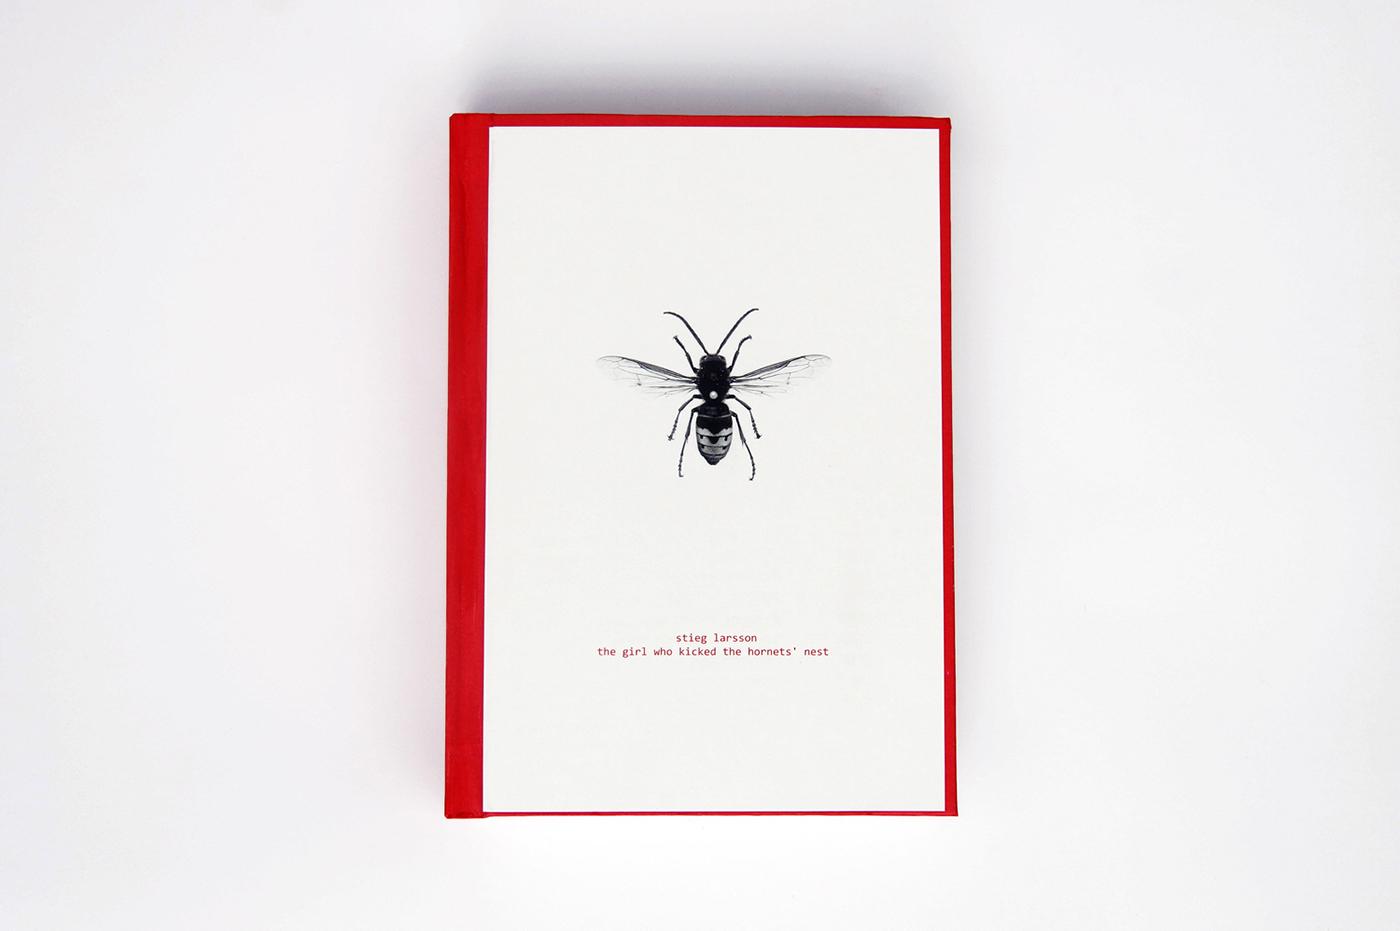 book cover book cover millenium criminal Layout Stieg Larsson dragon tattoo salander coding hackers hacking hornet minimal minimalist